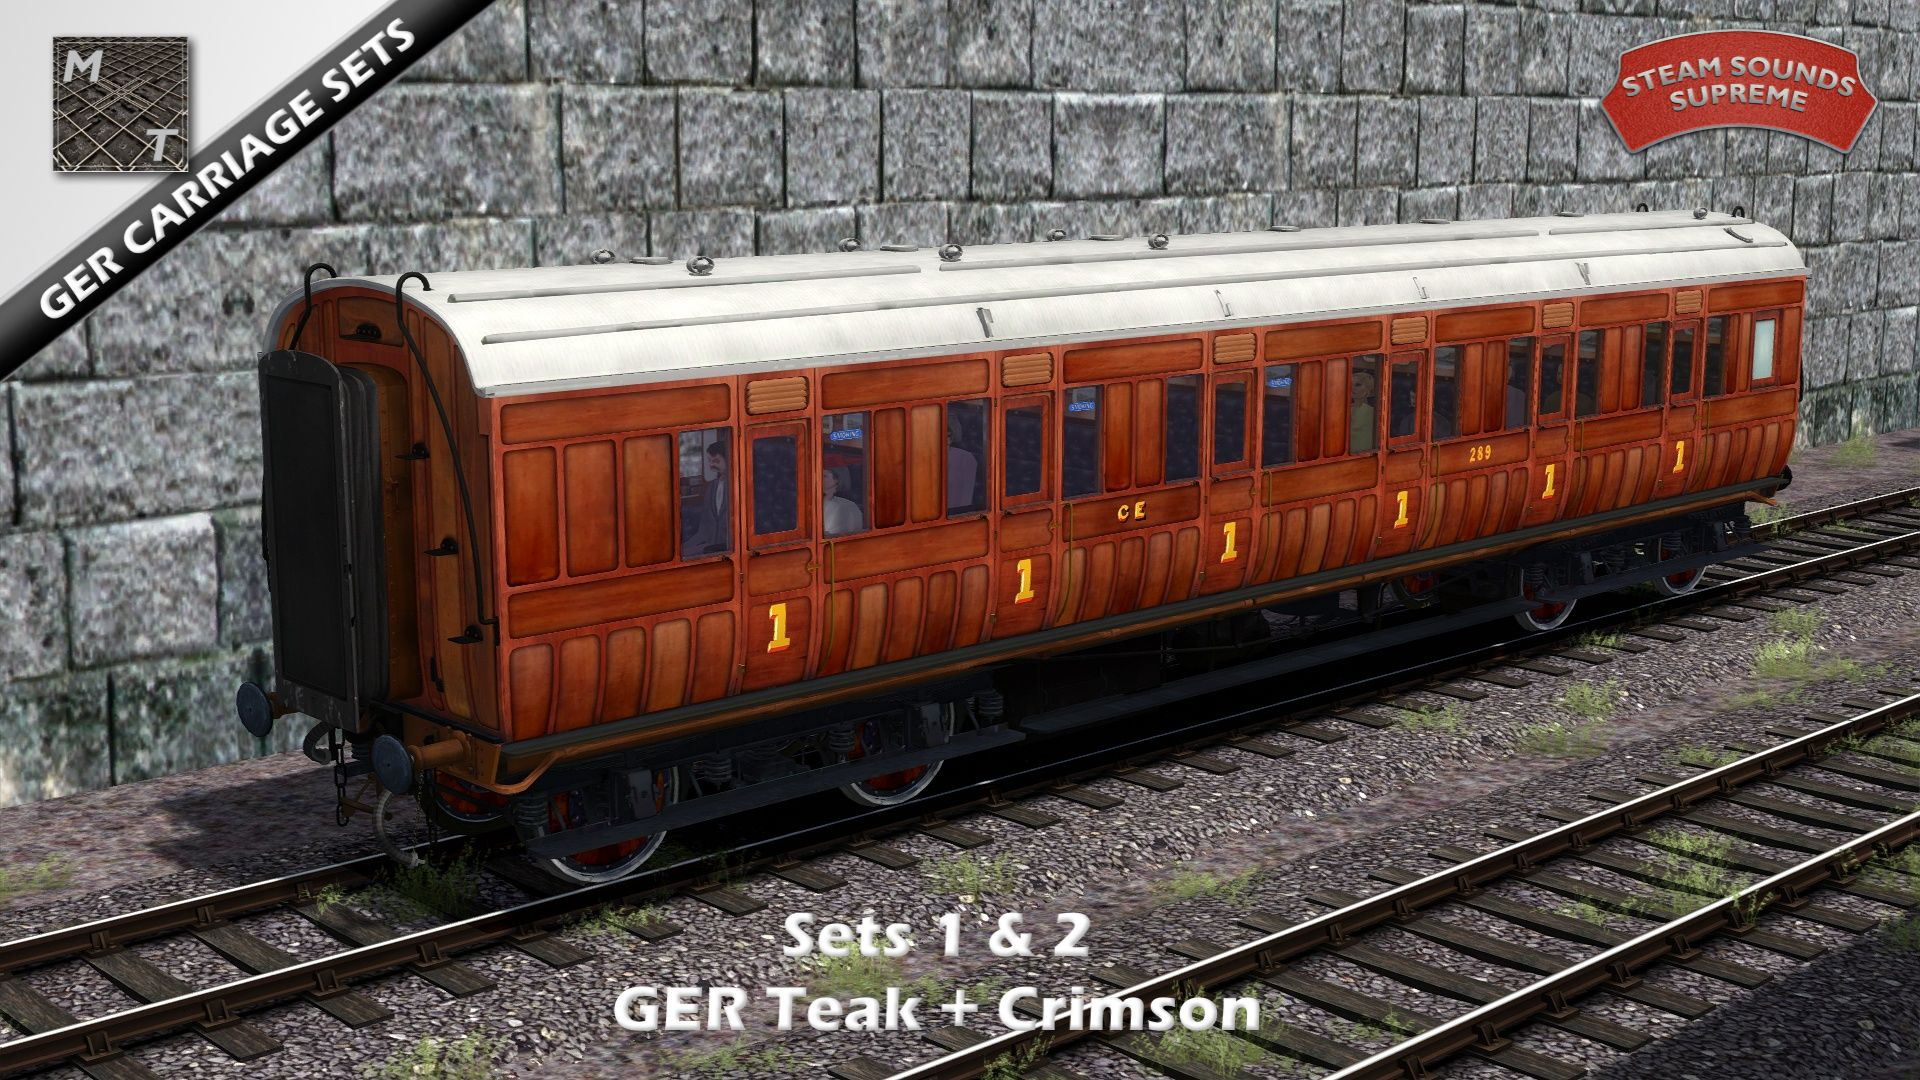 GERCorrSet1-2_05.jpg